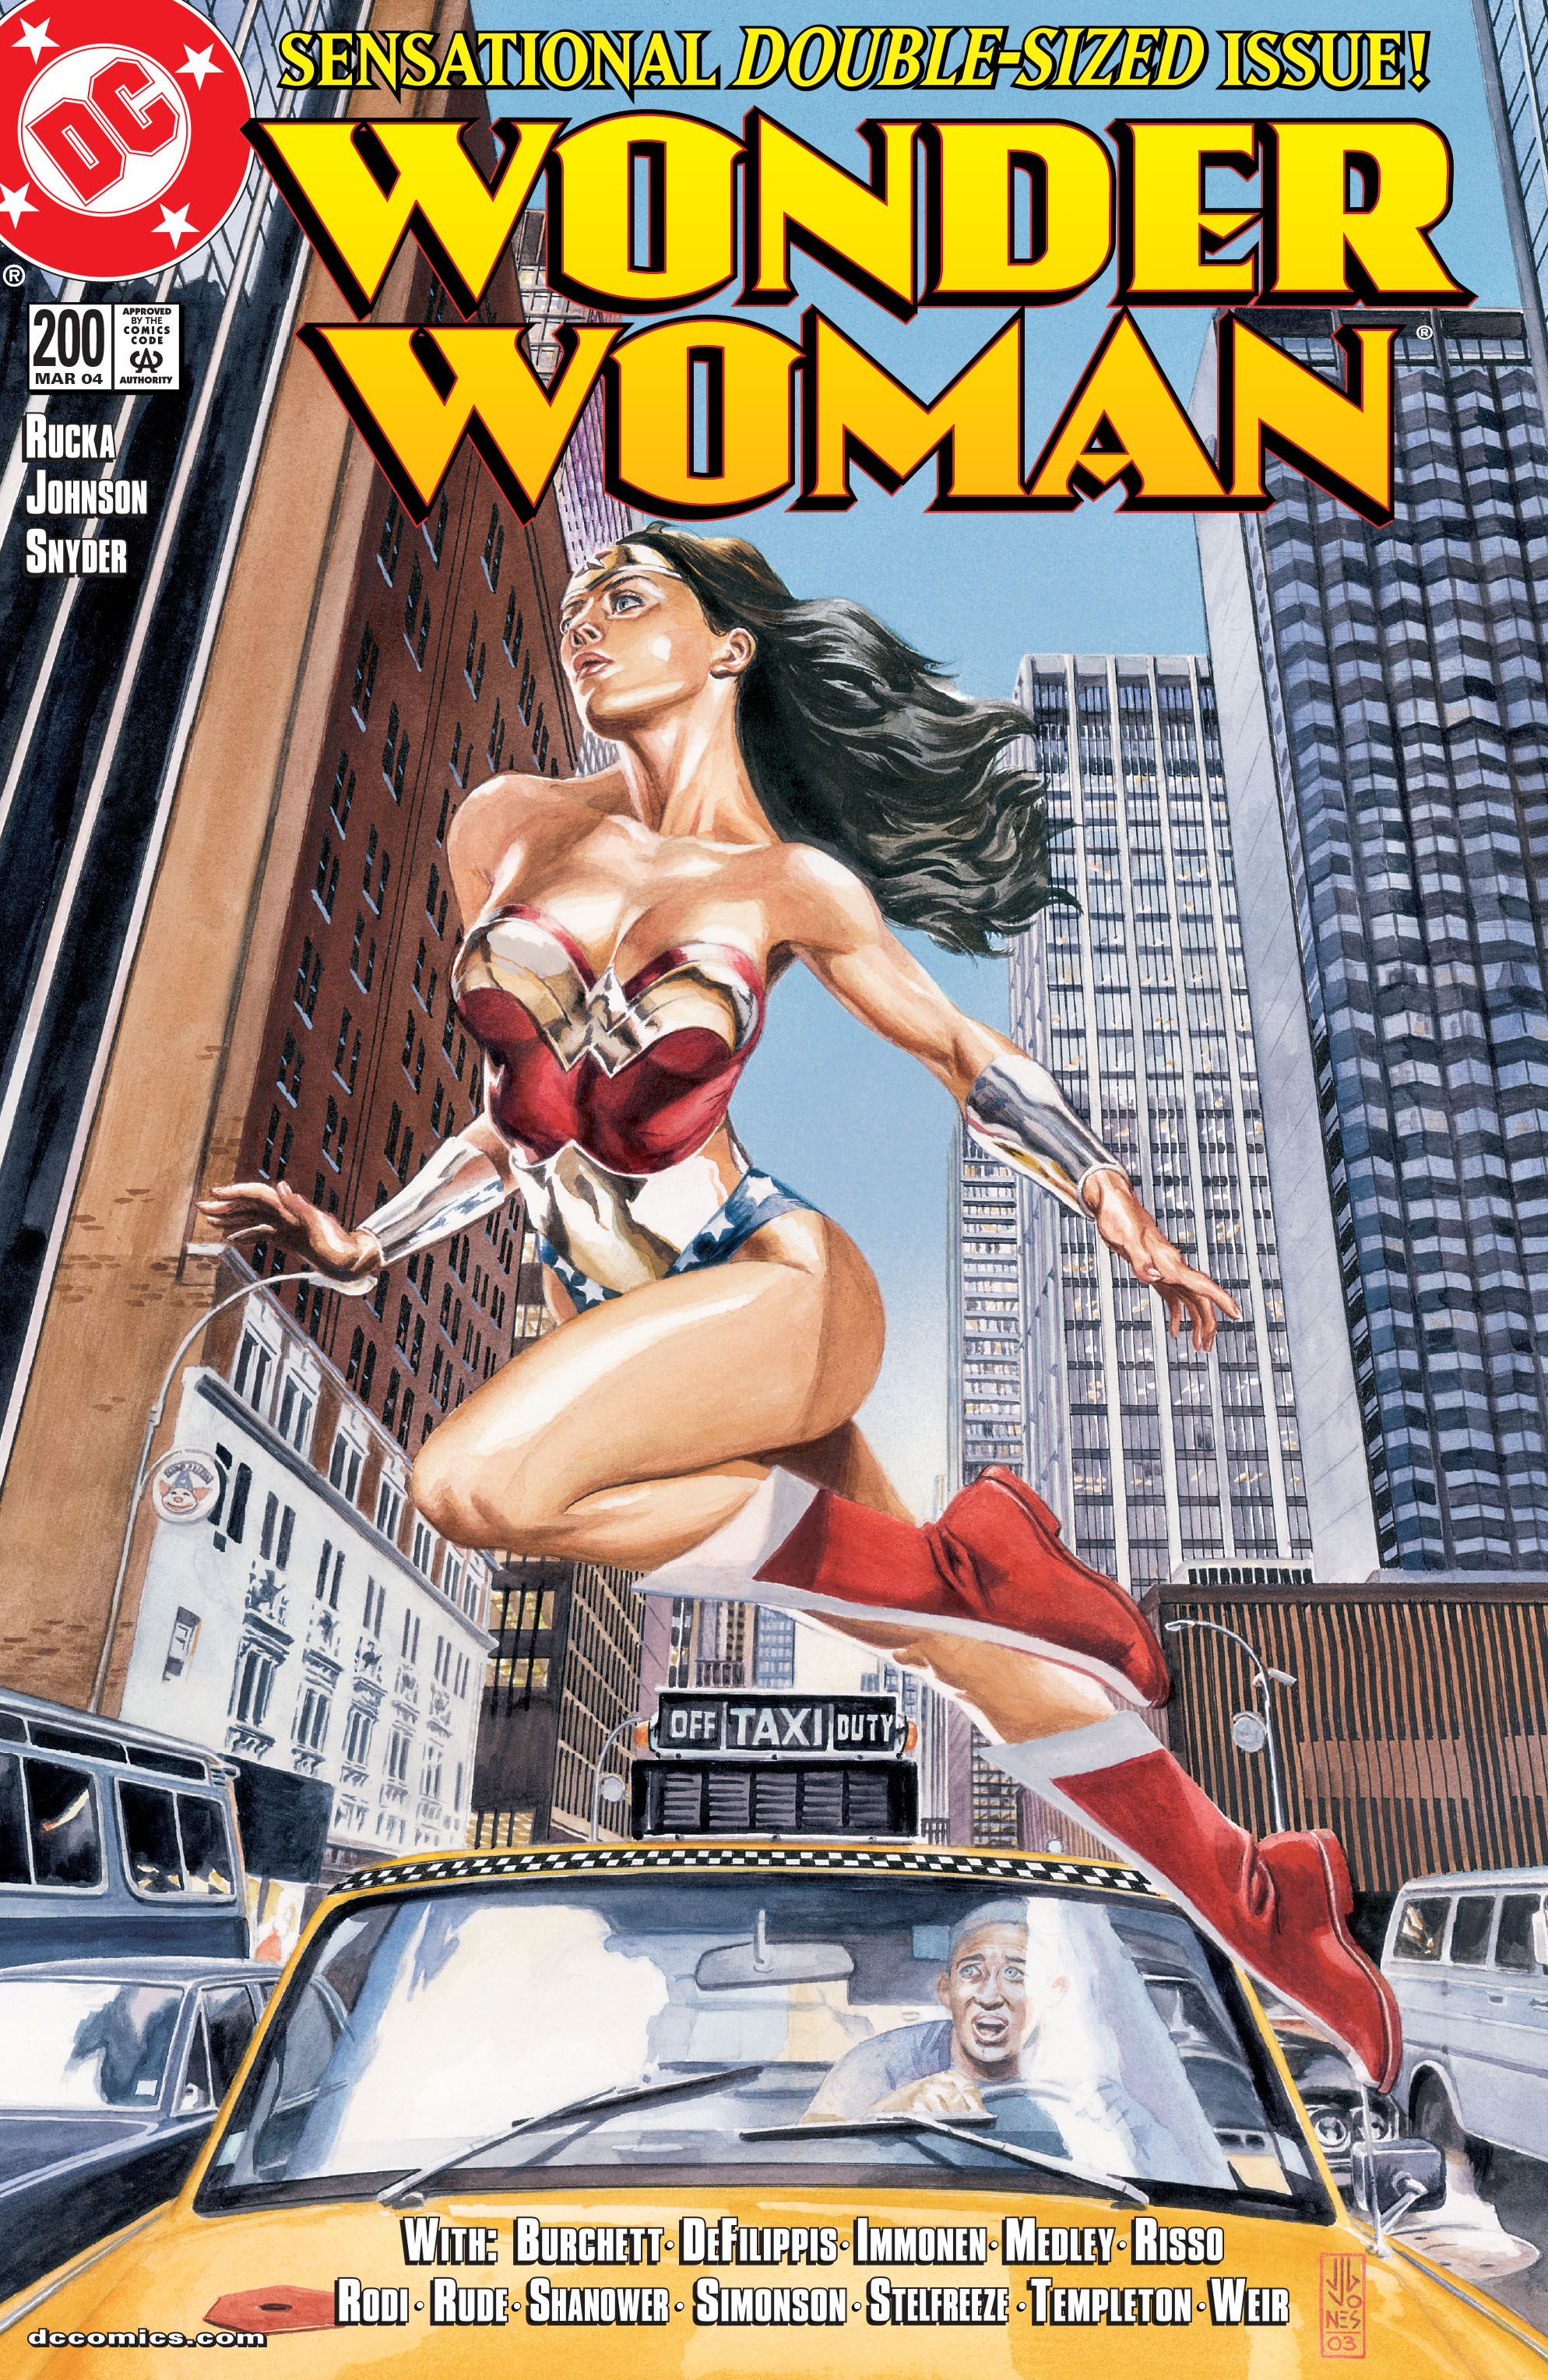 Read online Wonder Woman (1987) comic -  Issue #200 - 1